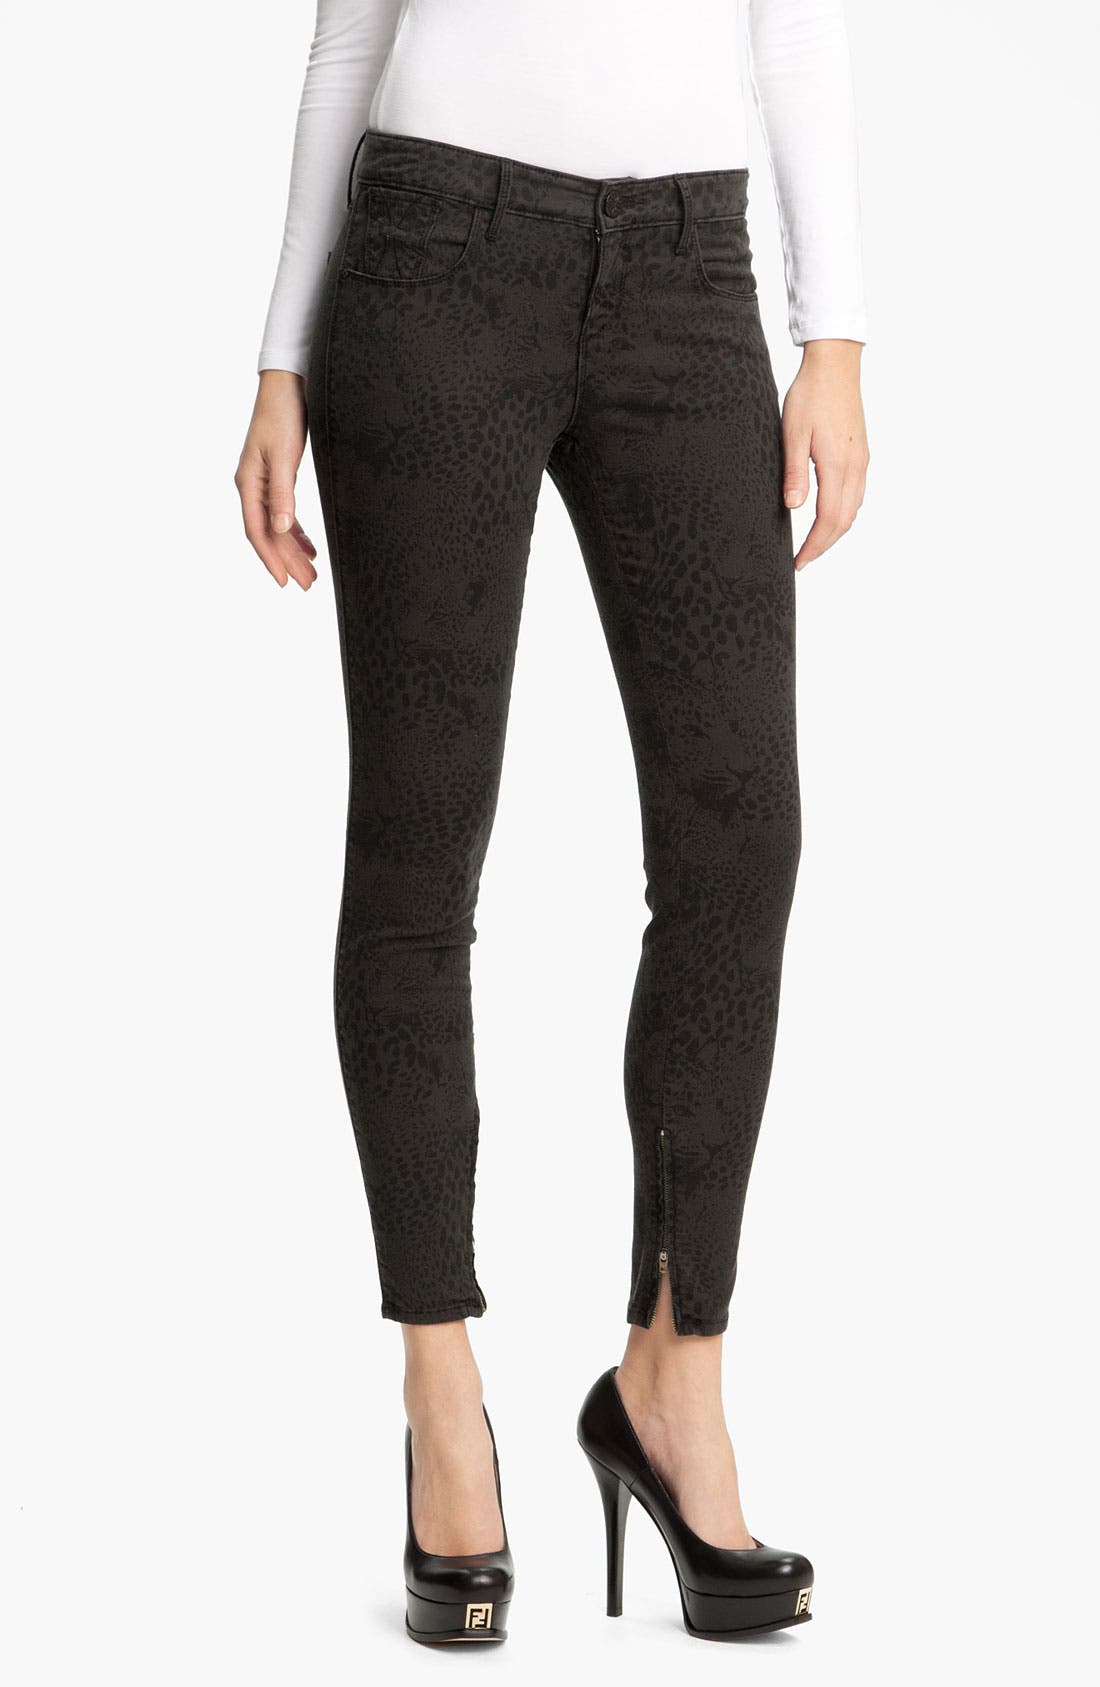 Main Image - Habitual 'Almas' Leopard Print Skinny Stretch Jeans